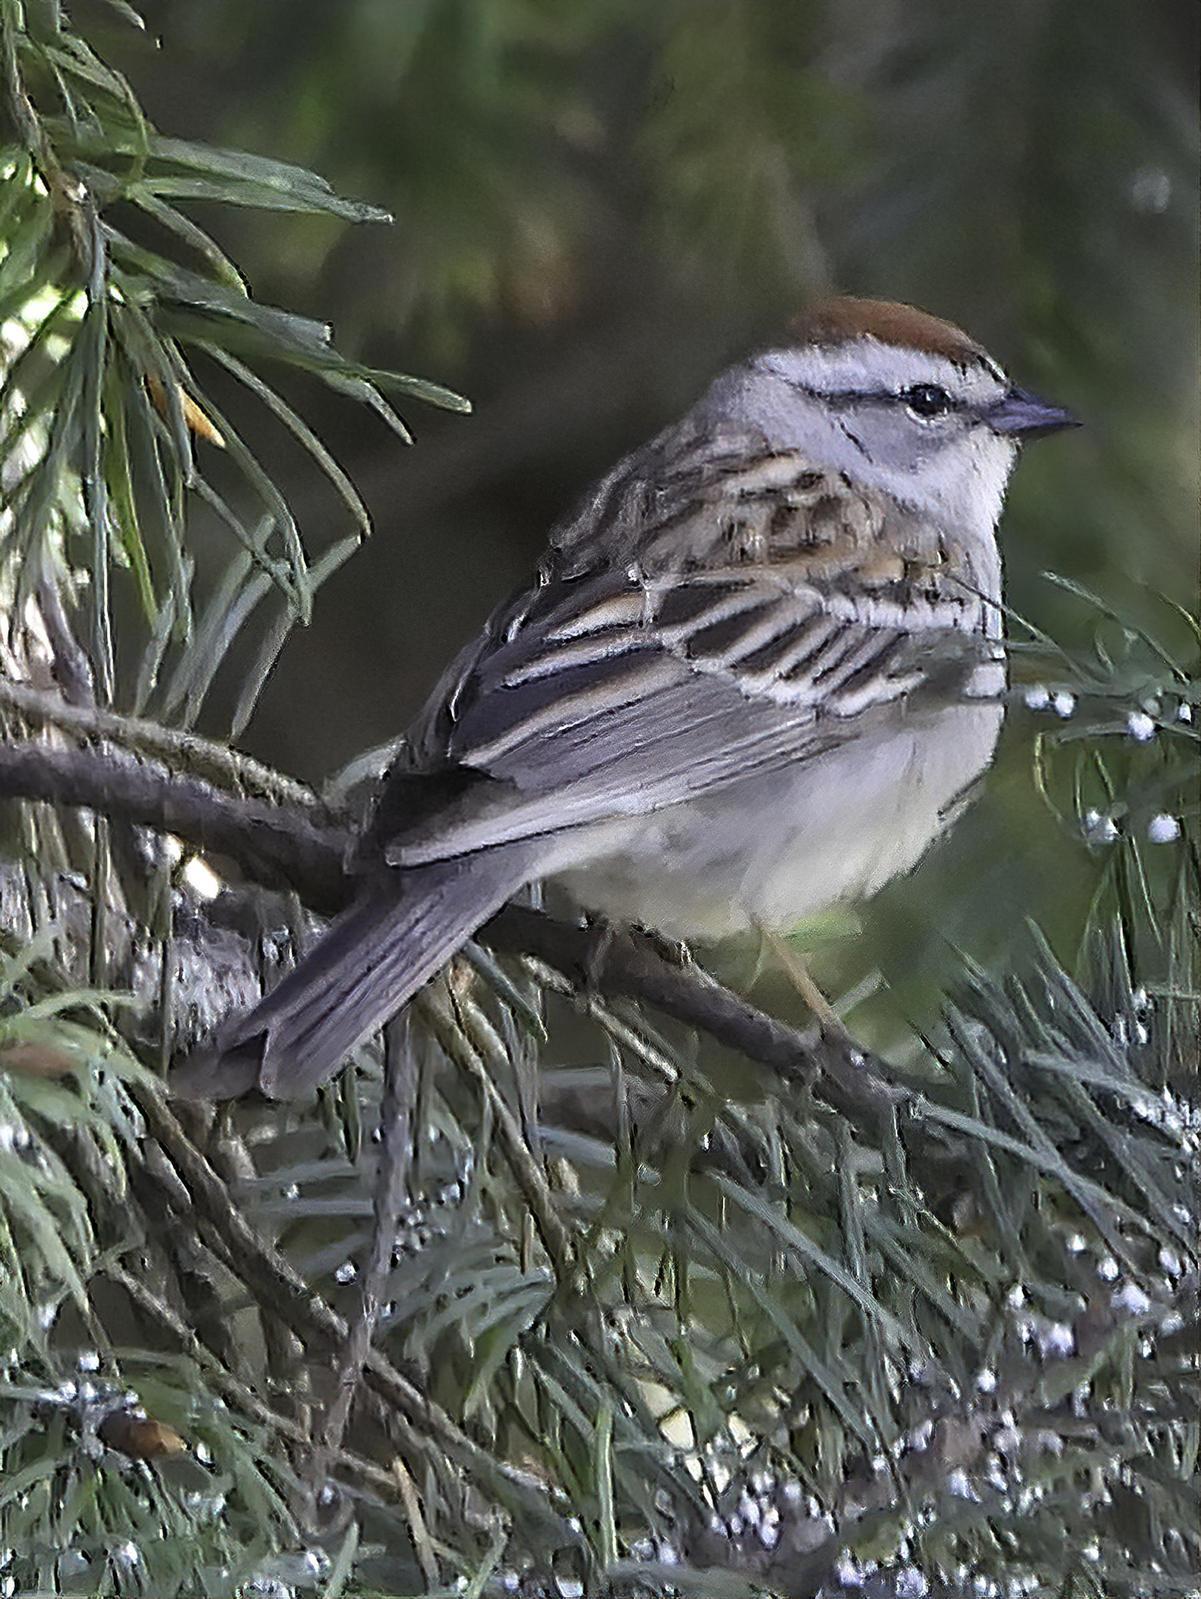 Chipping Sparrow Photo by Dan Tallman